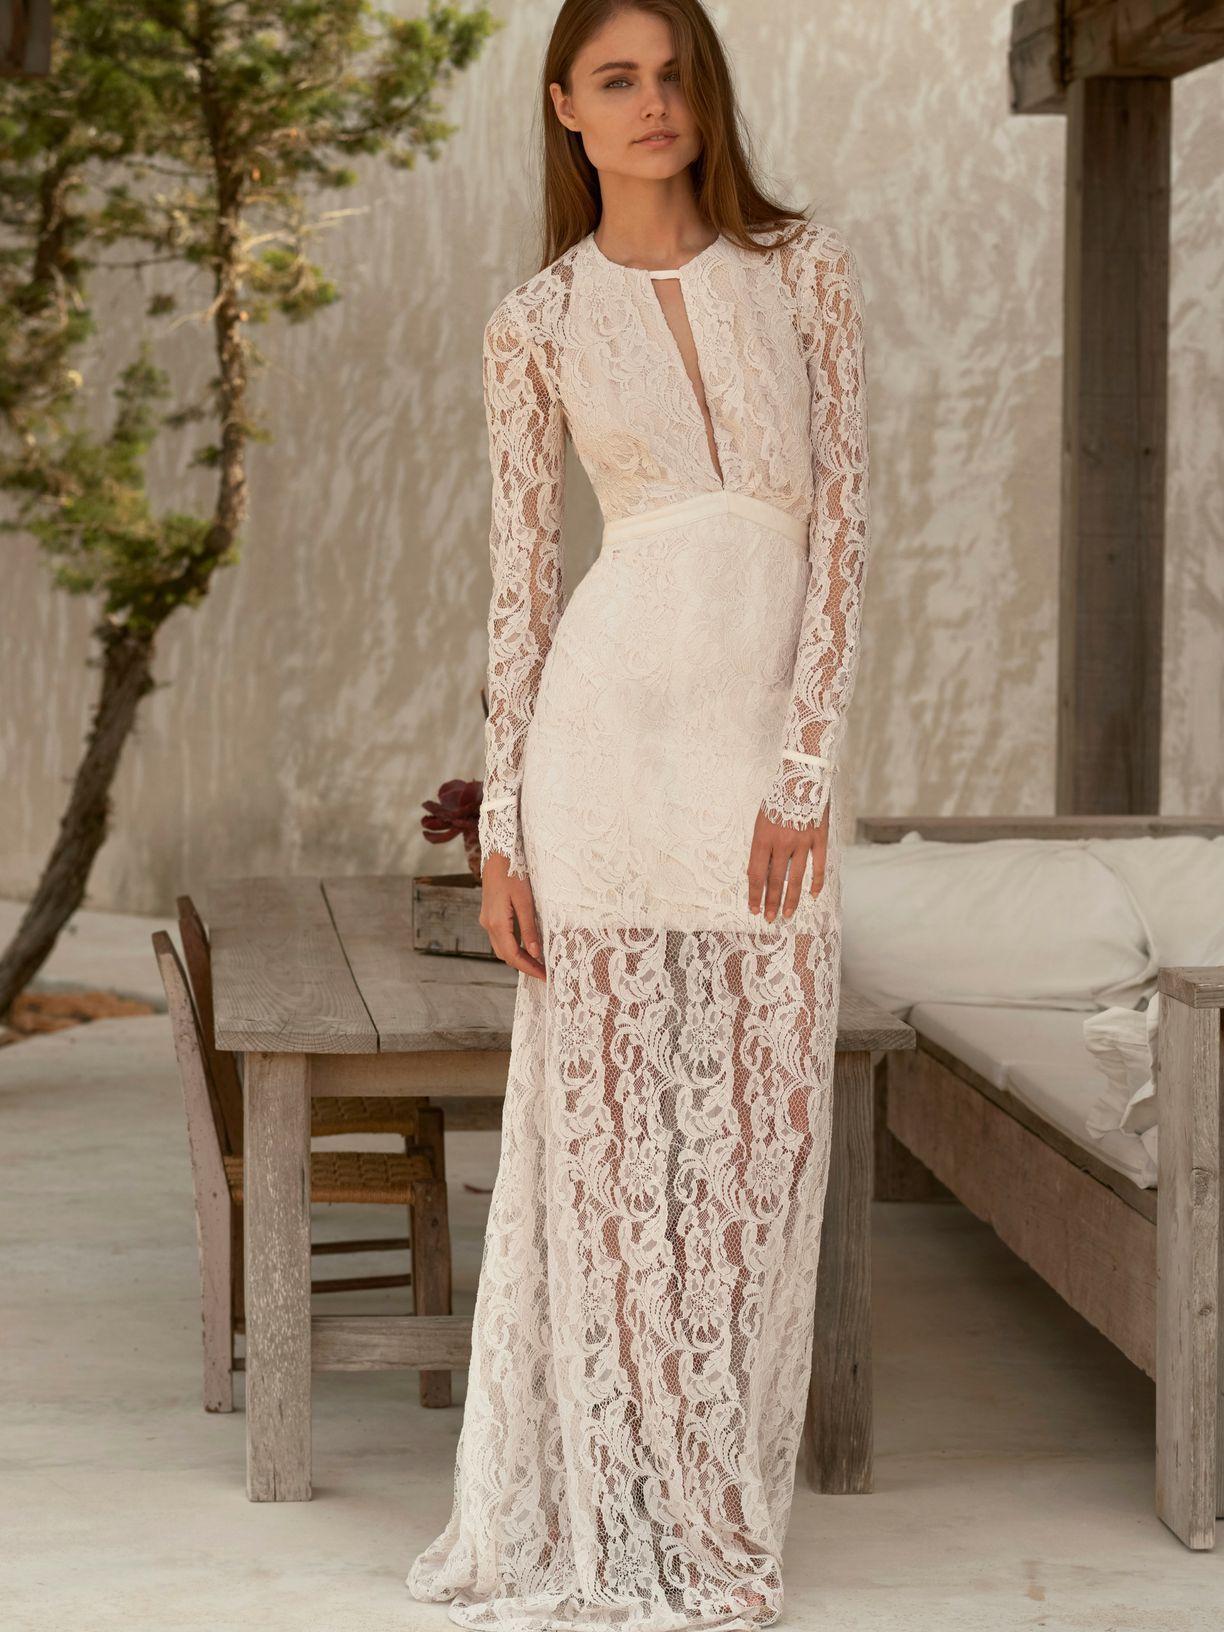 The jetset diaries voyage maxi dress maxi dresses scalloped lace